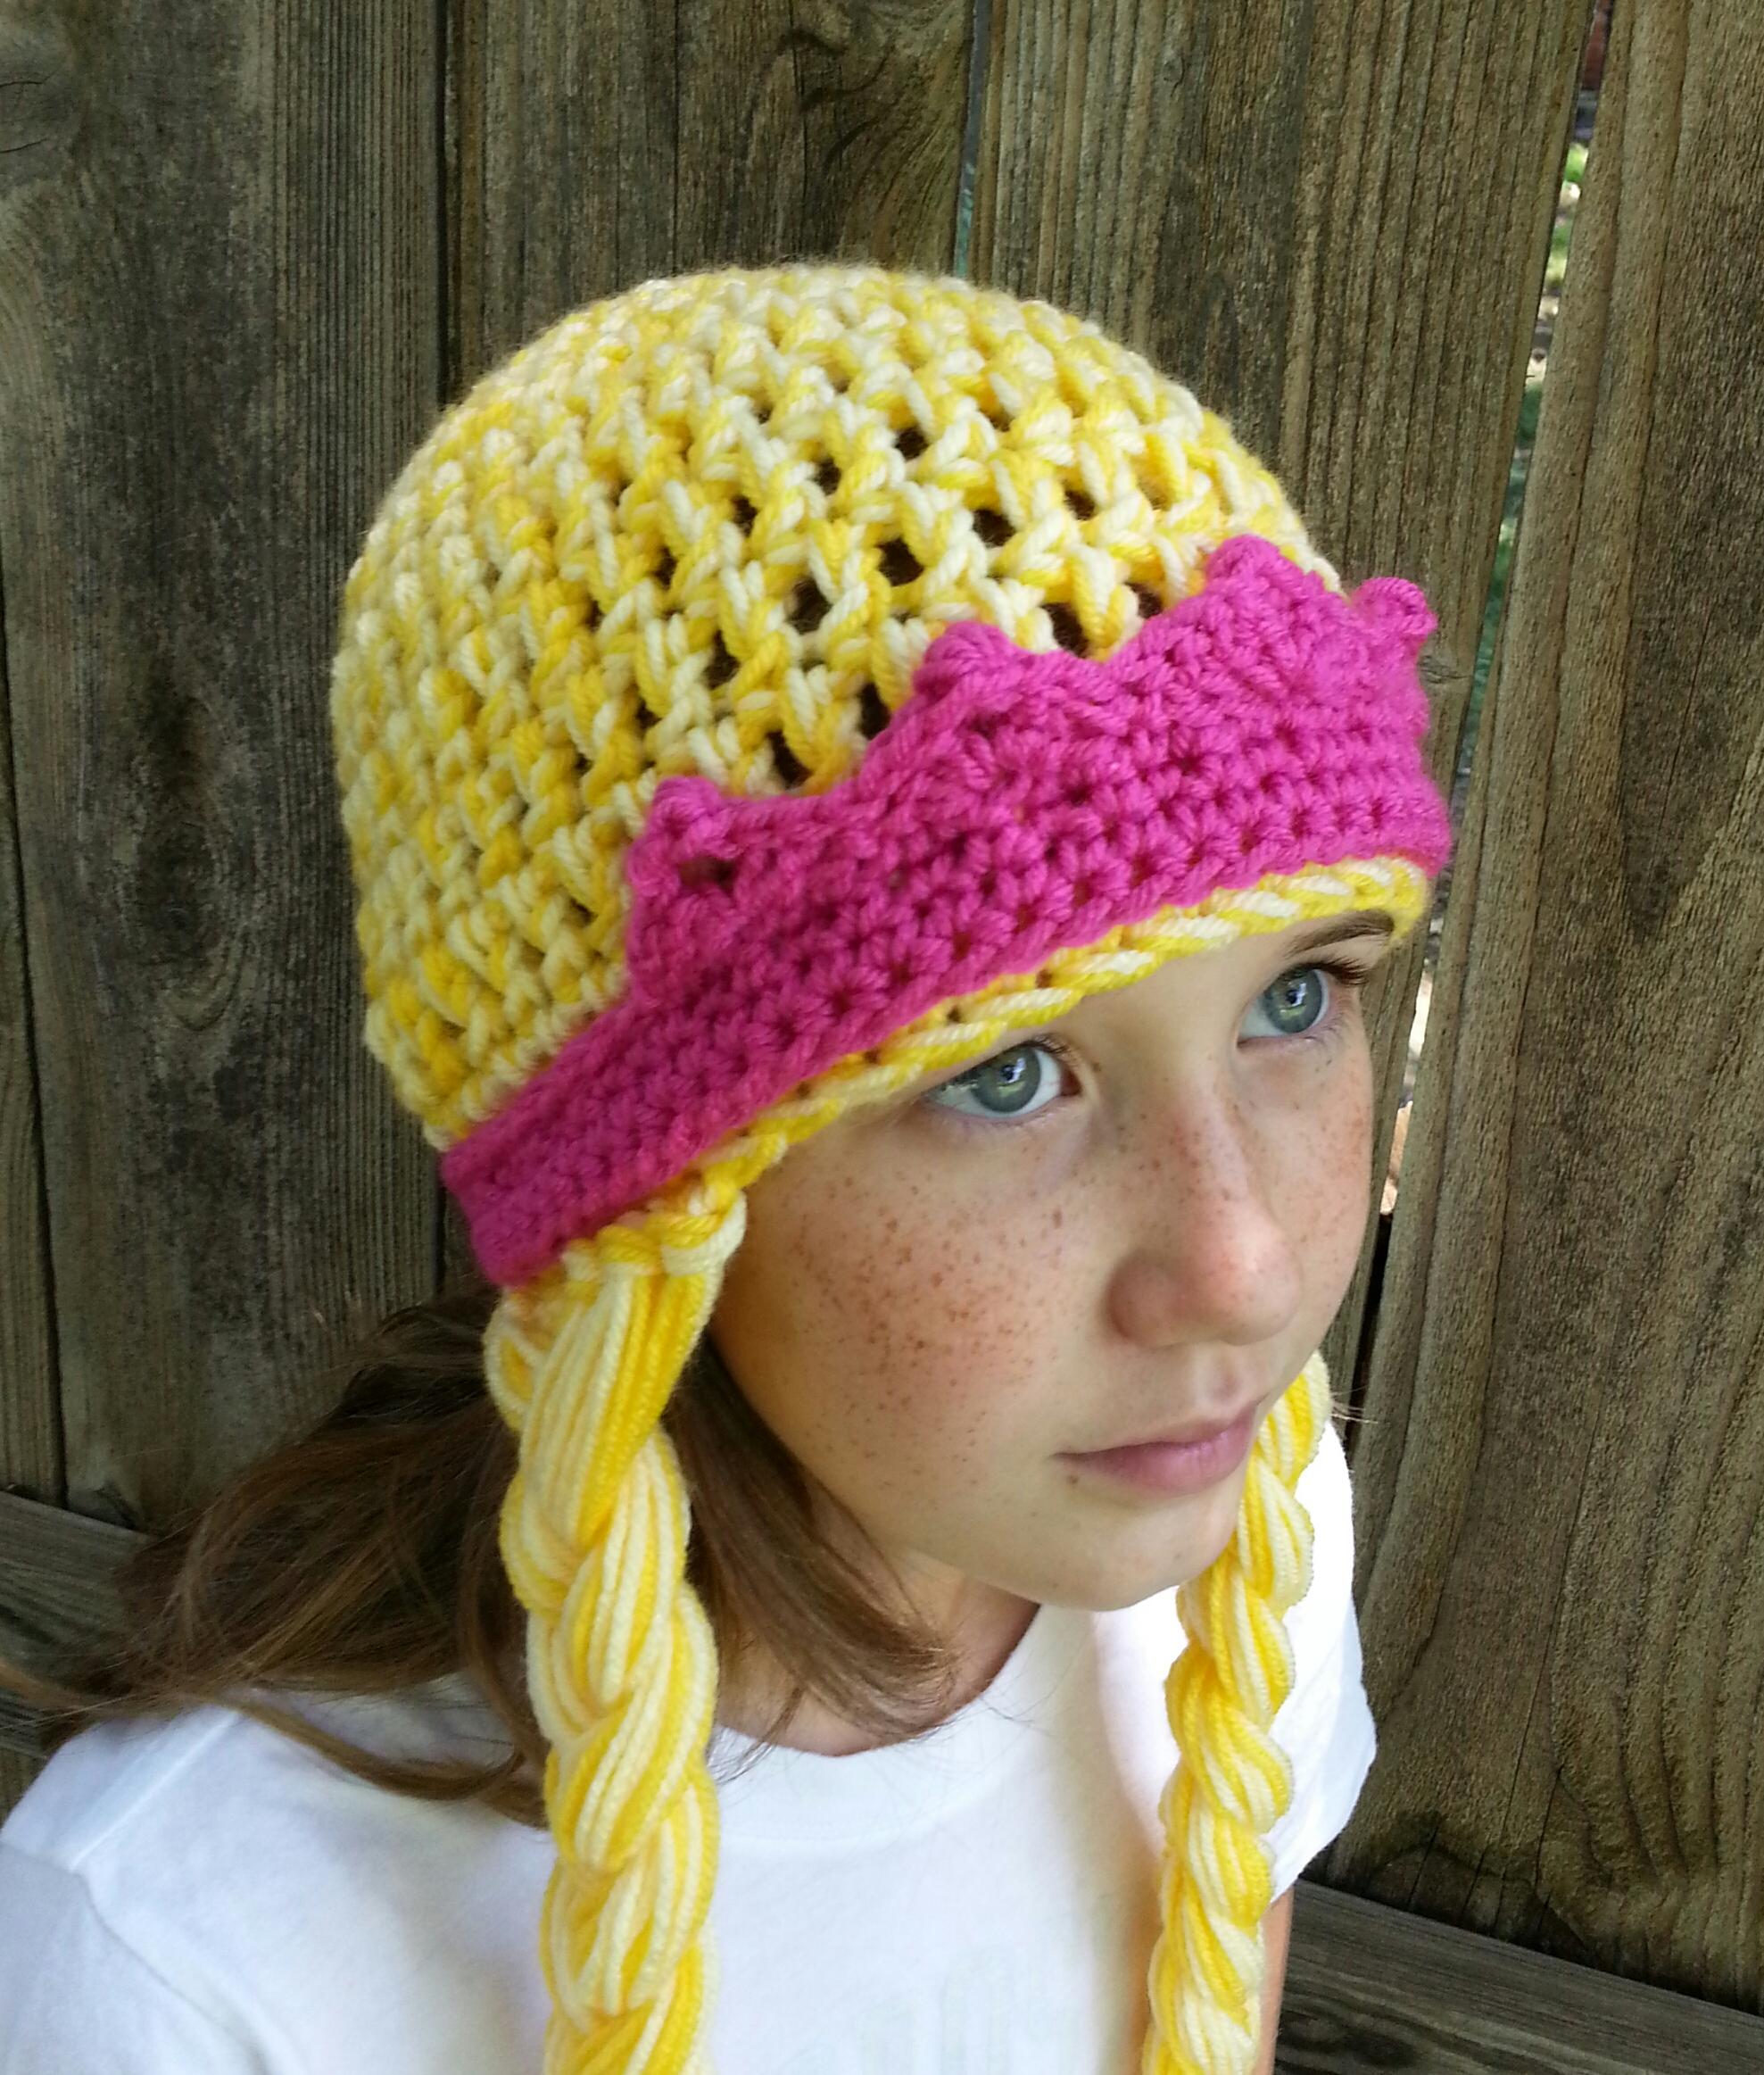 Rapunzel Crochet Hat www.galleryhip.com - The Hippest Pics